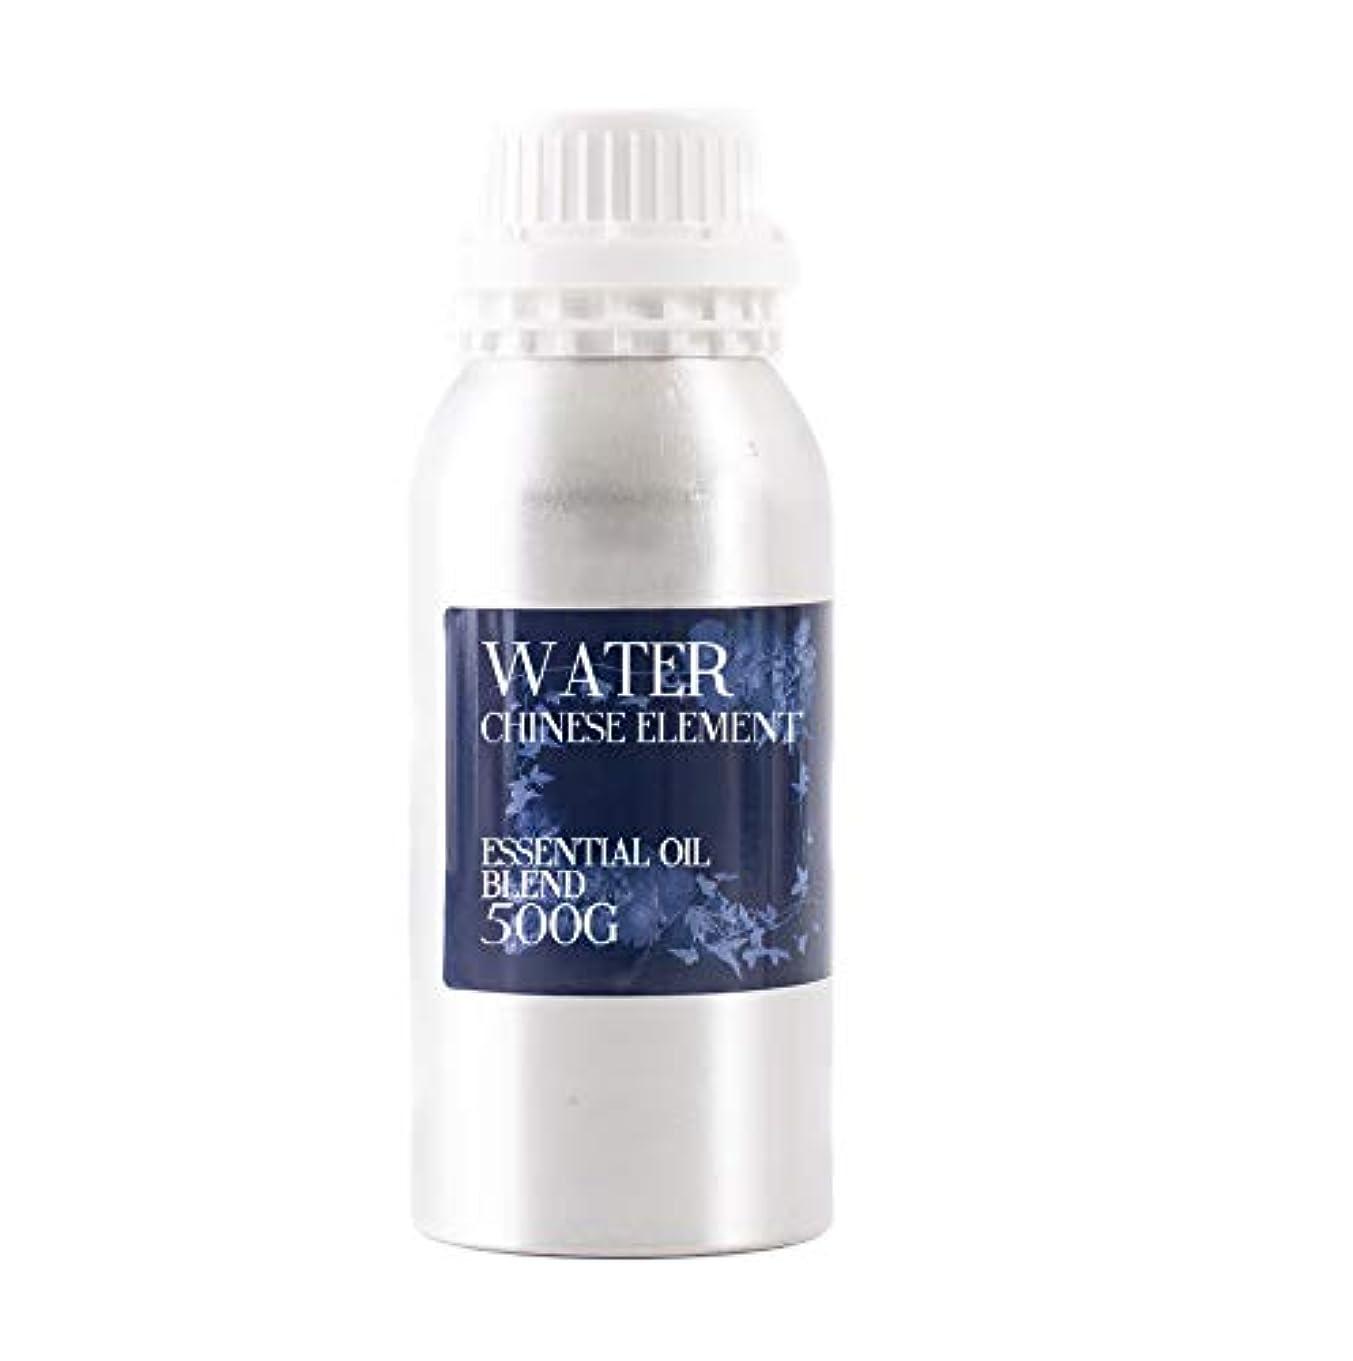 高潔な自由伝染性Mystix London | Chinese Water Element Essential Oil Blend - 500g